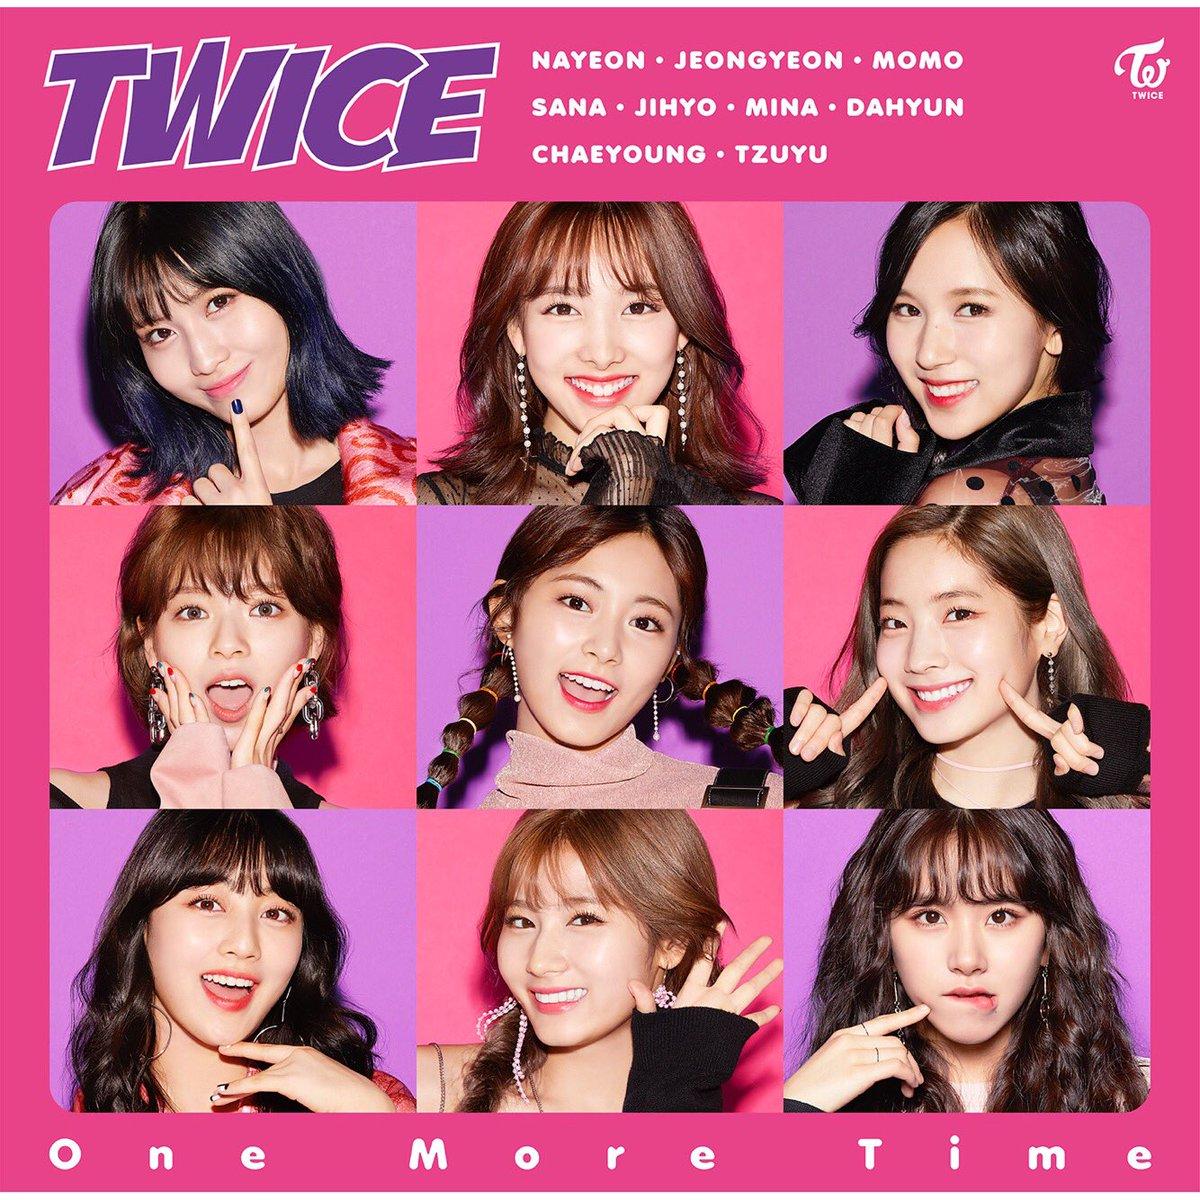 Twice 人気 順 TWICEメンバー人気順最新ランキング!2021日本・韓国・国別まとめ